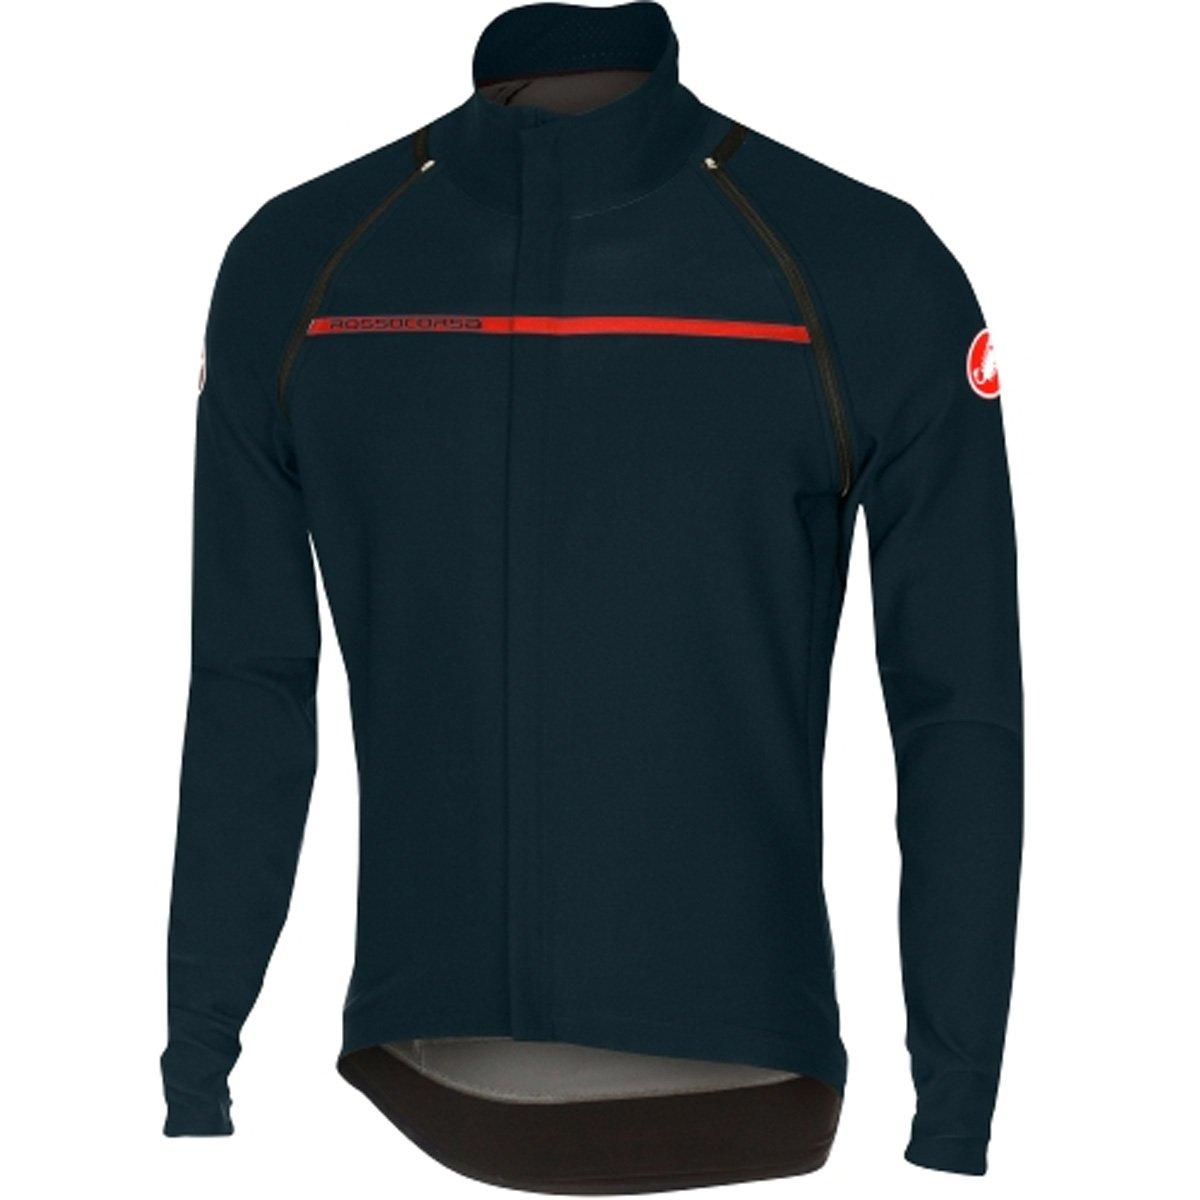 CastelliメンズPerfetto Convertible Cycling Jacket B079DL47GF Medium|dark infinity blue dark infinity blue Medium